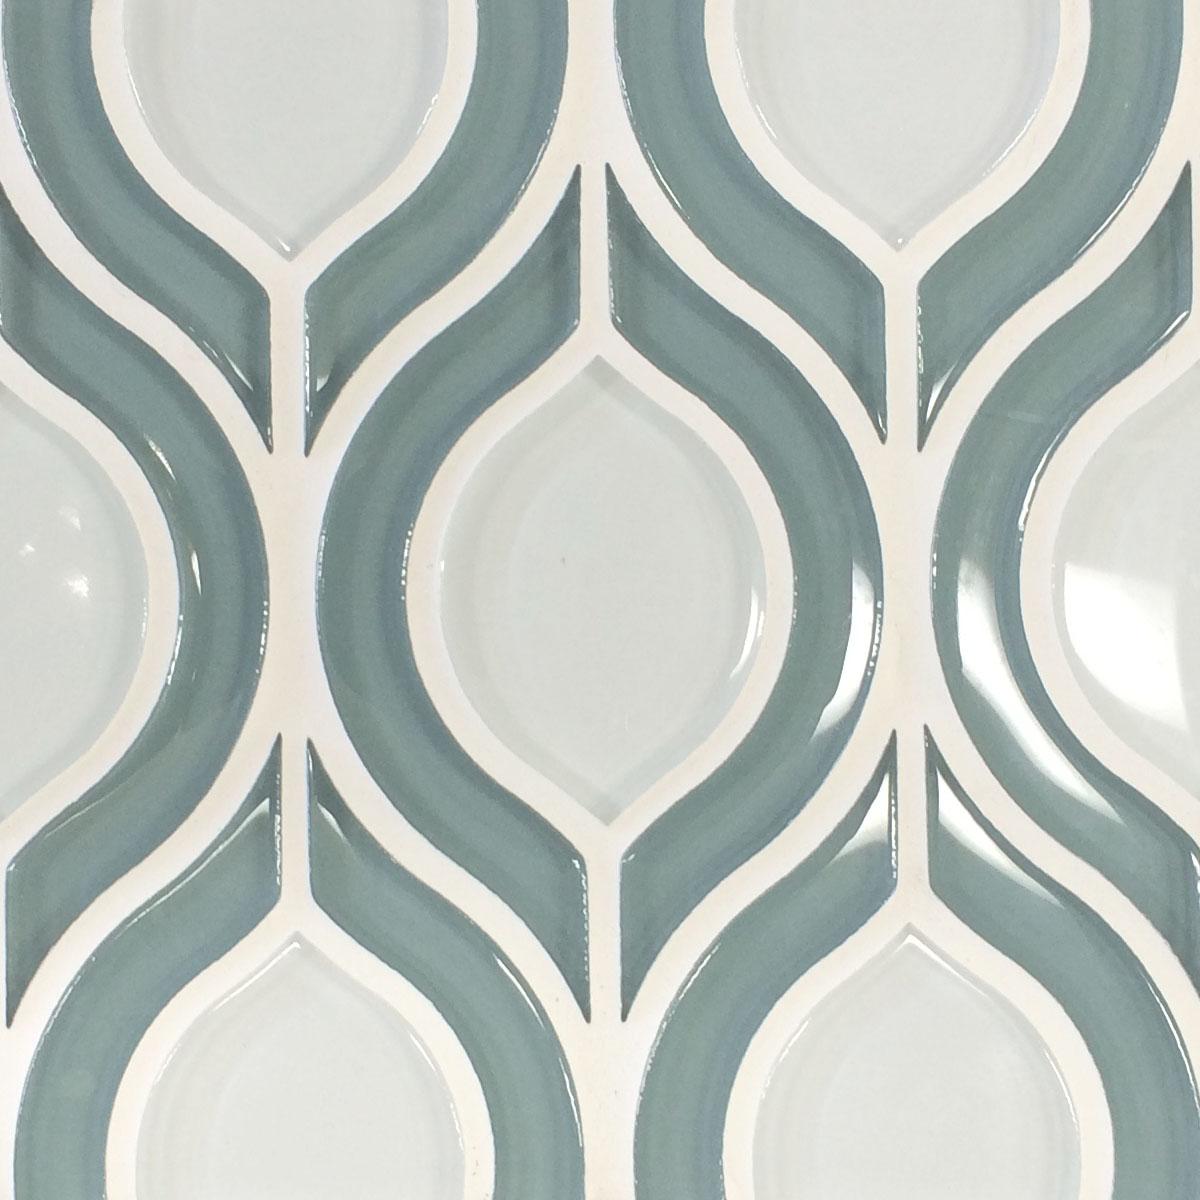 Glass Tile - Texture, Depth, Endless Possibilities!